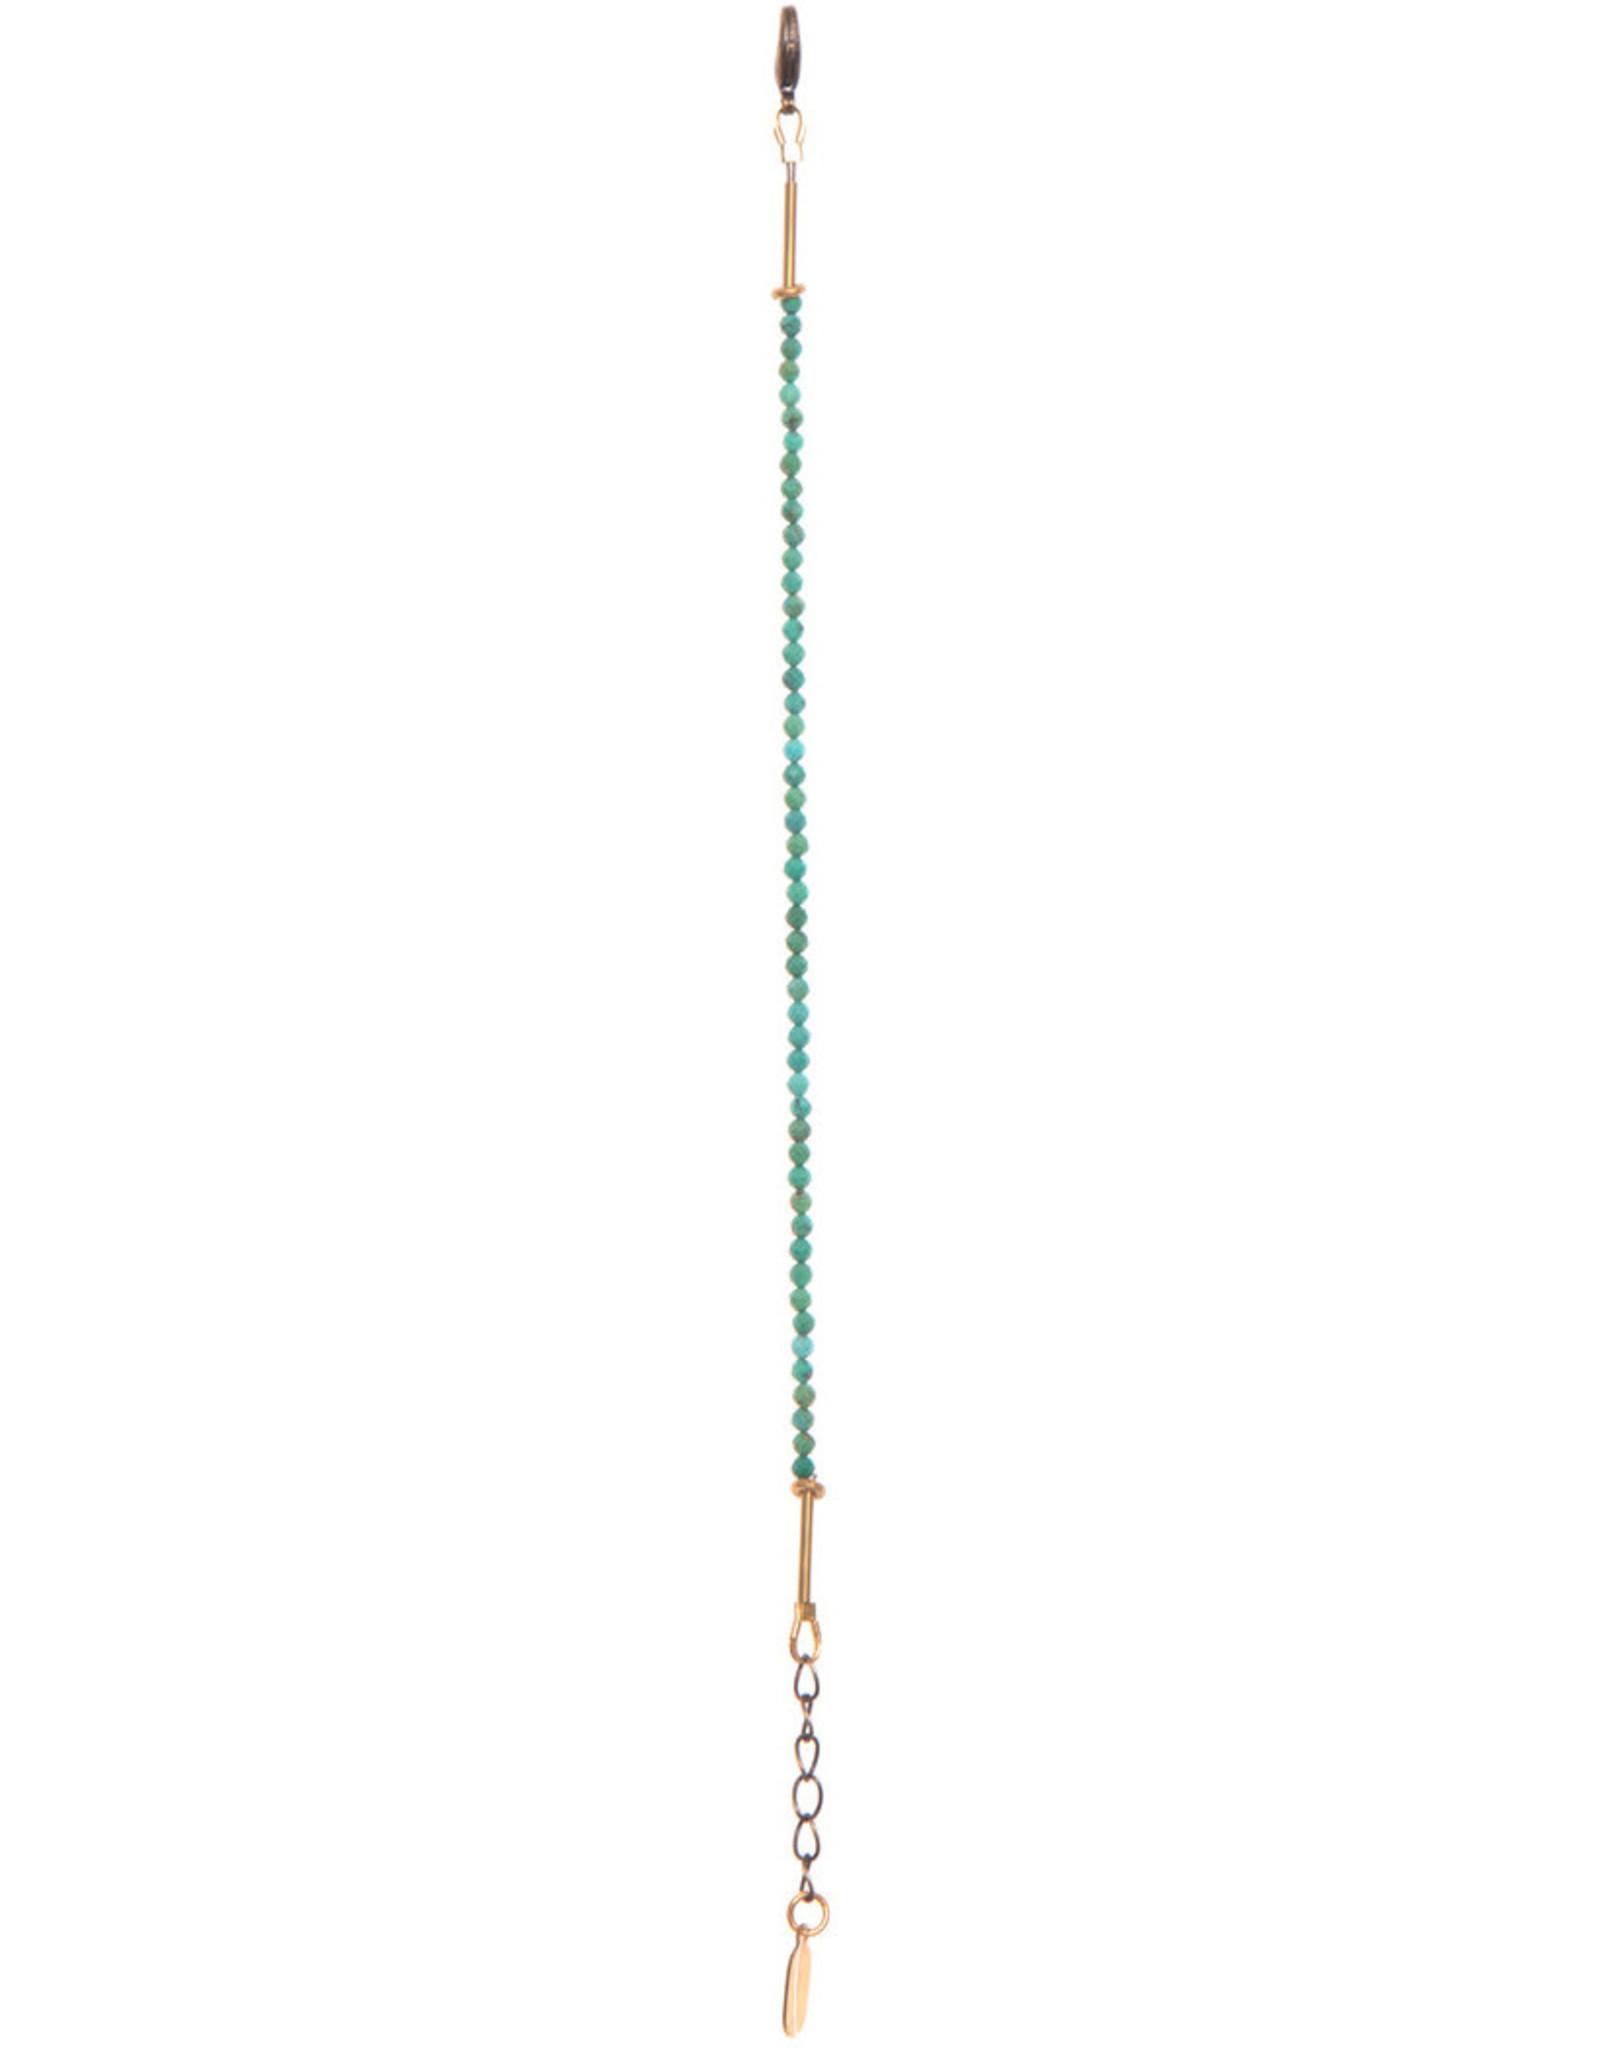 Hailey Gerrits Designs Stone Bracelet - Green Turquoise